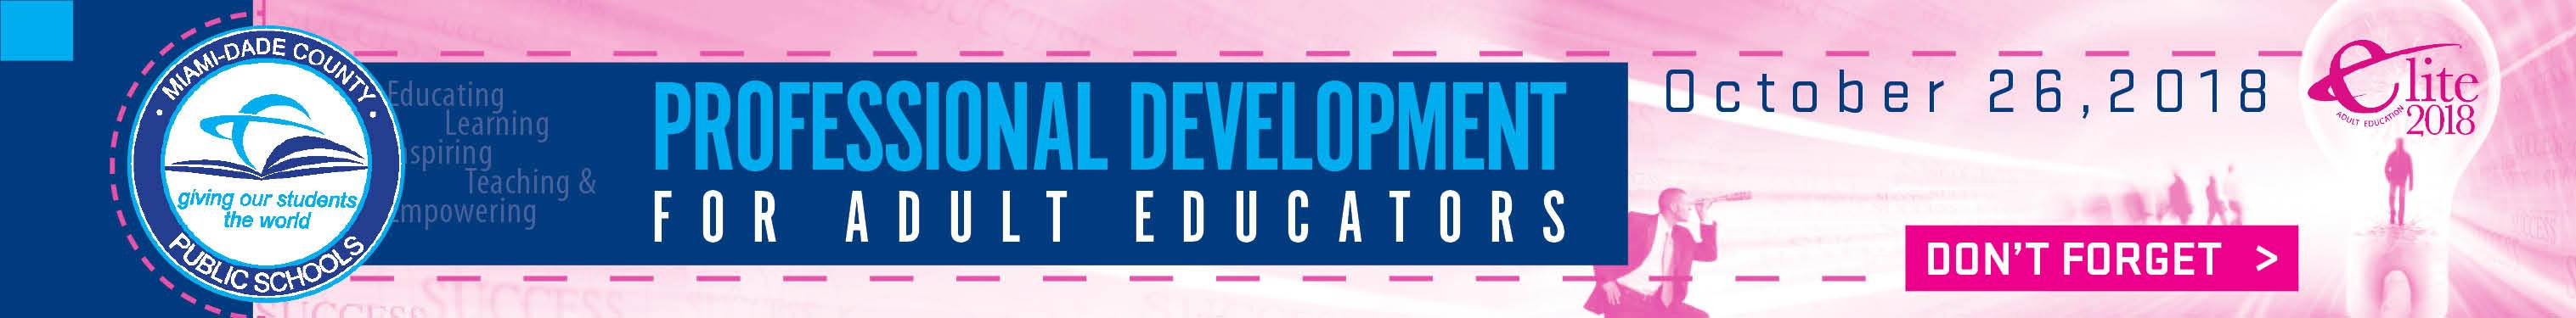 NEW Elite 2018 Retargeting Banners 728x90 - Elite Professional Development for Adult Educators